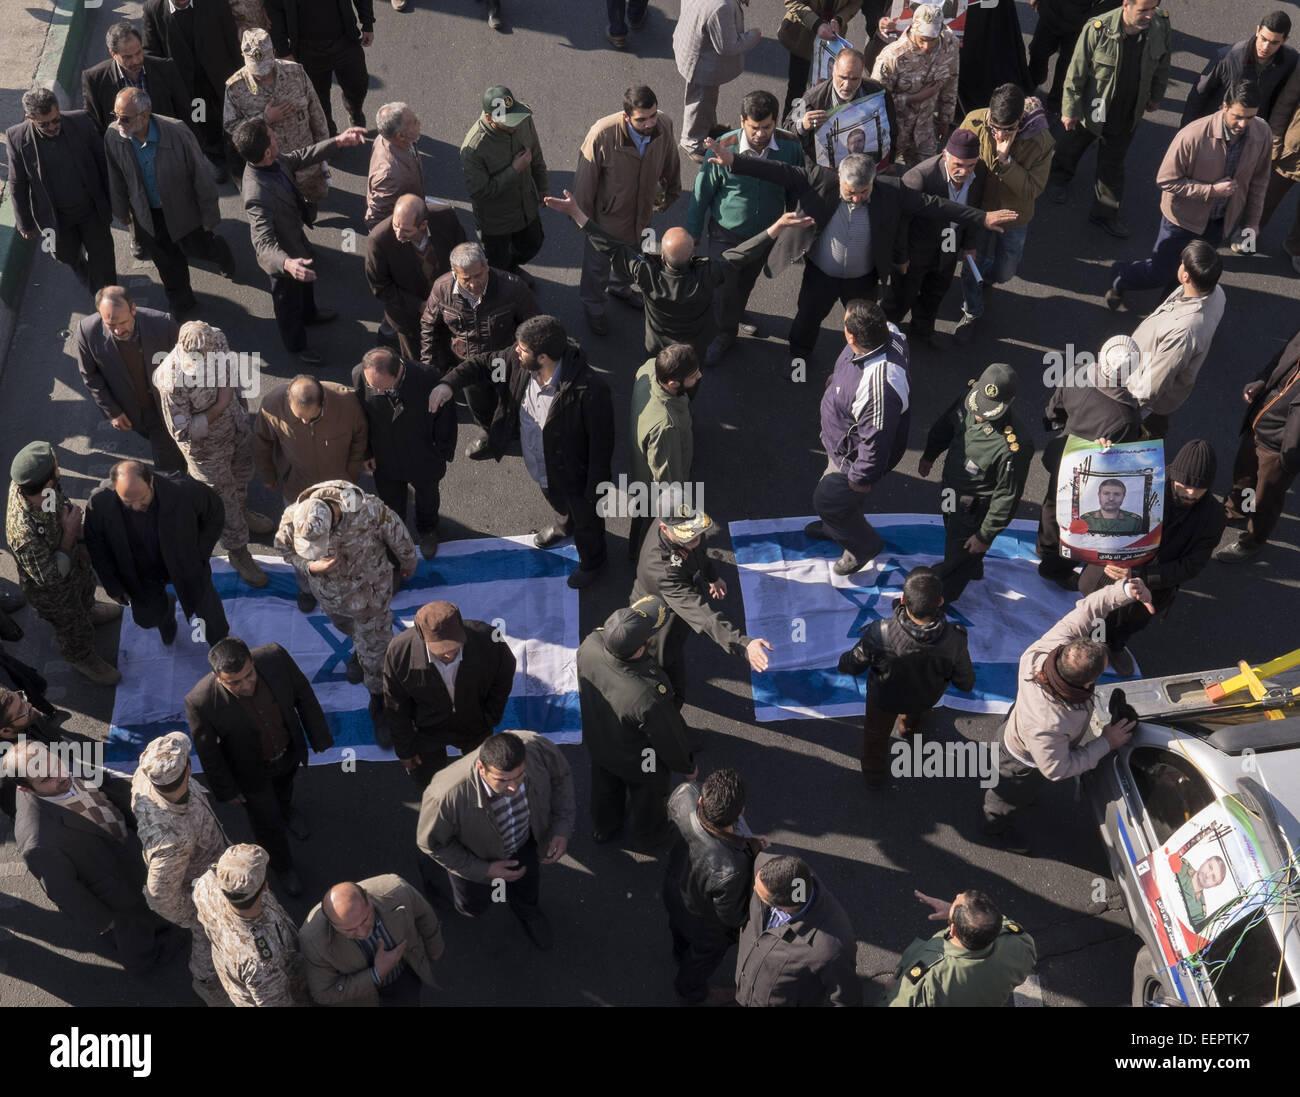 Tehran, Iran. 21st Jan, 2015. January 21, 2015 - Tehran, Iran - Iranians and members of the Revolutionary Guard - Stock Image